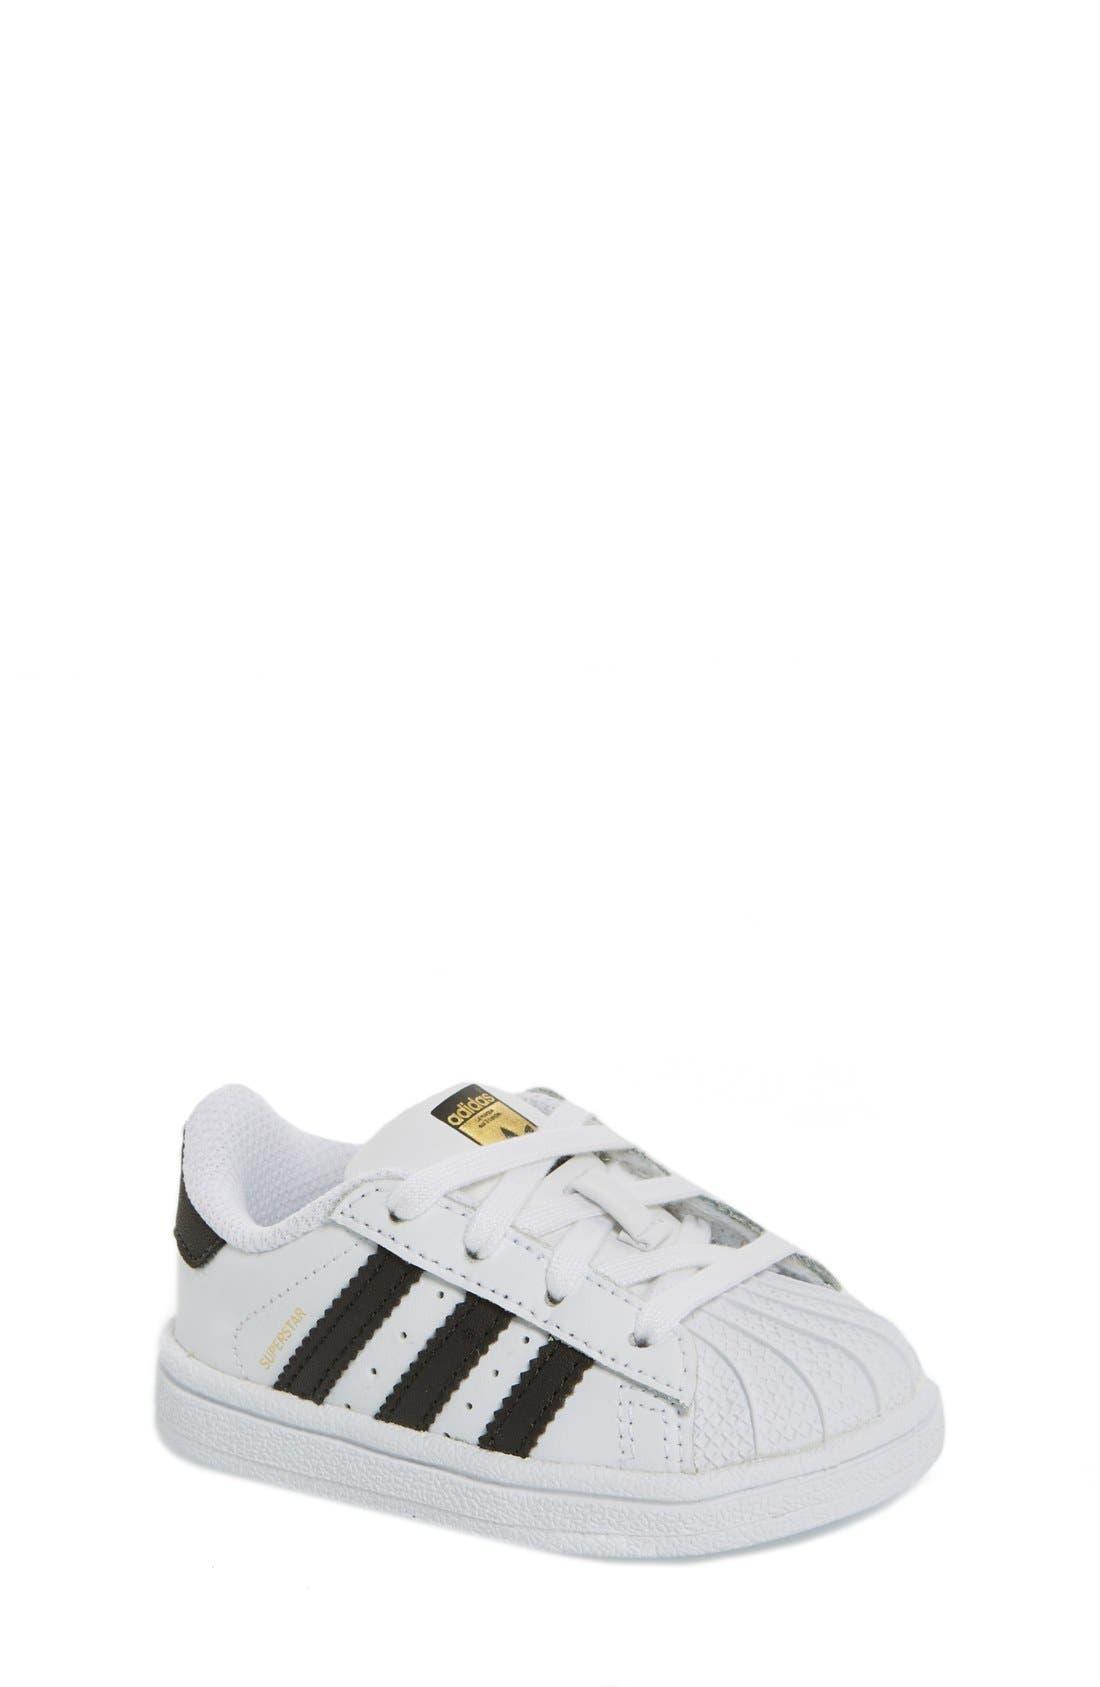 'Superstar' Sneaker,                         Main,                         color, White/ Black